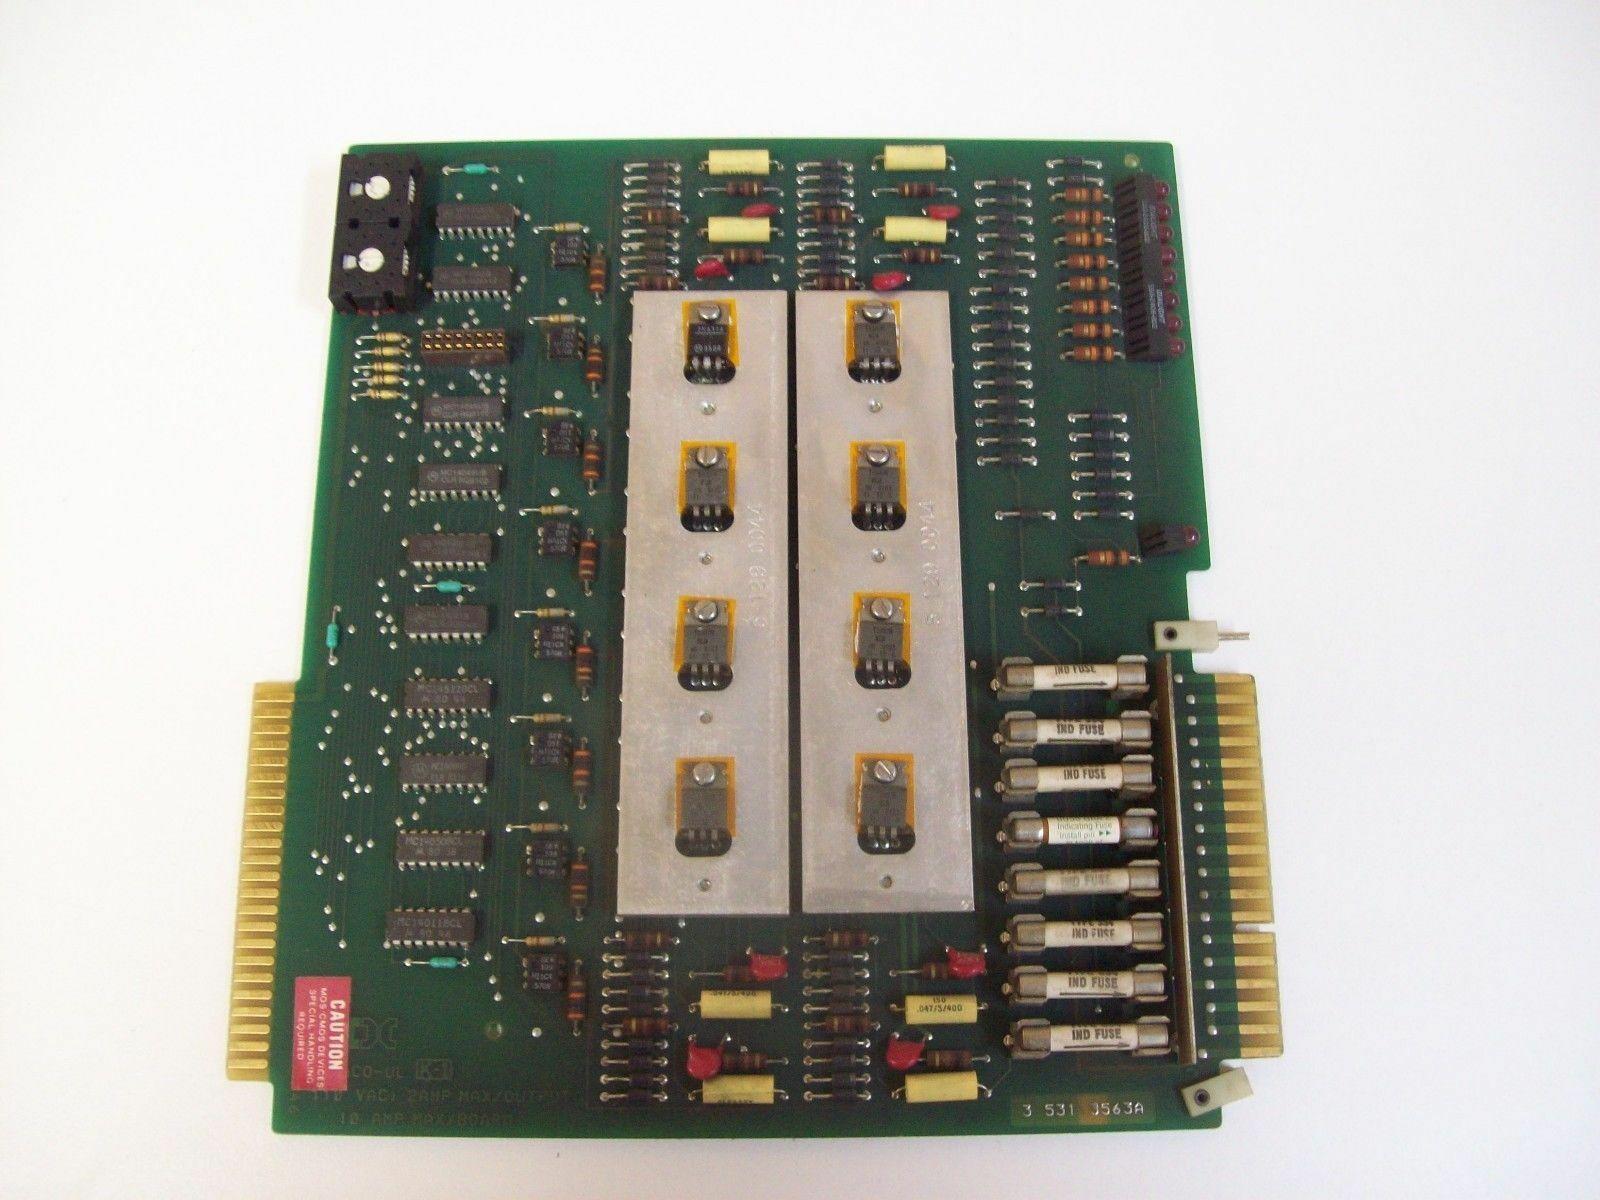 Cincinnati Acramatic Siemens CNC Control Board # 3-531-3563A